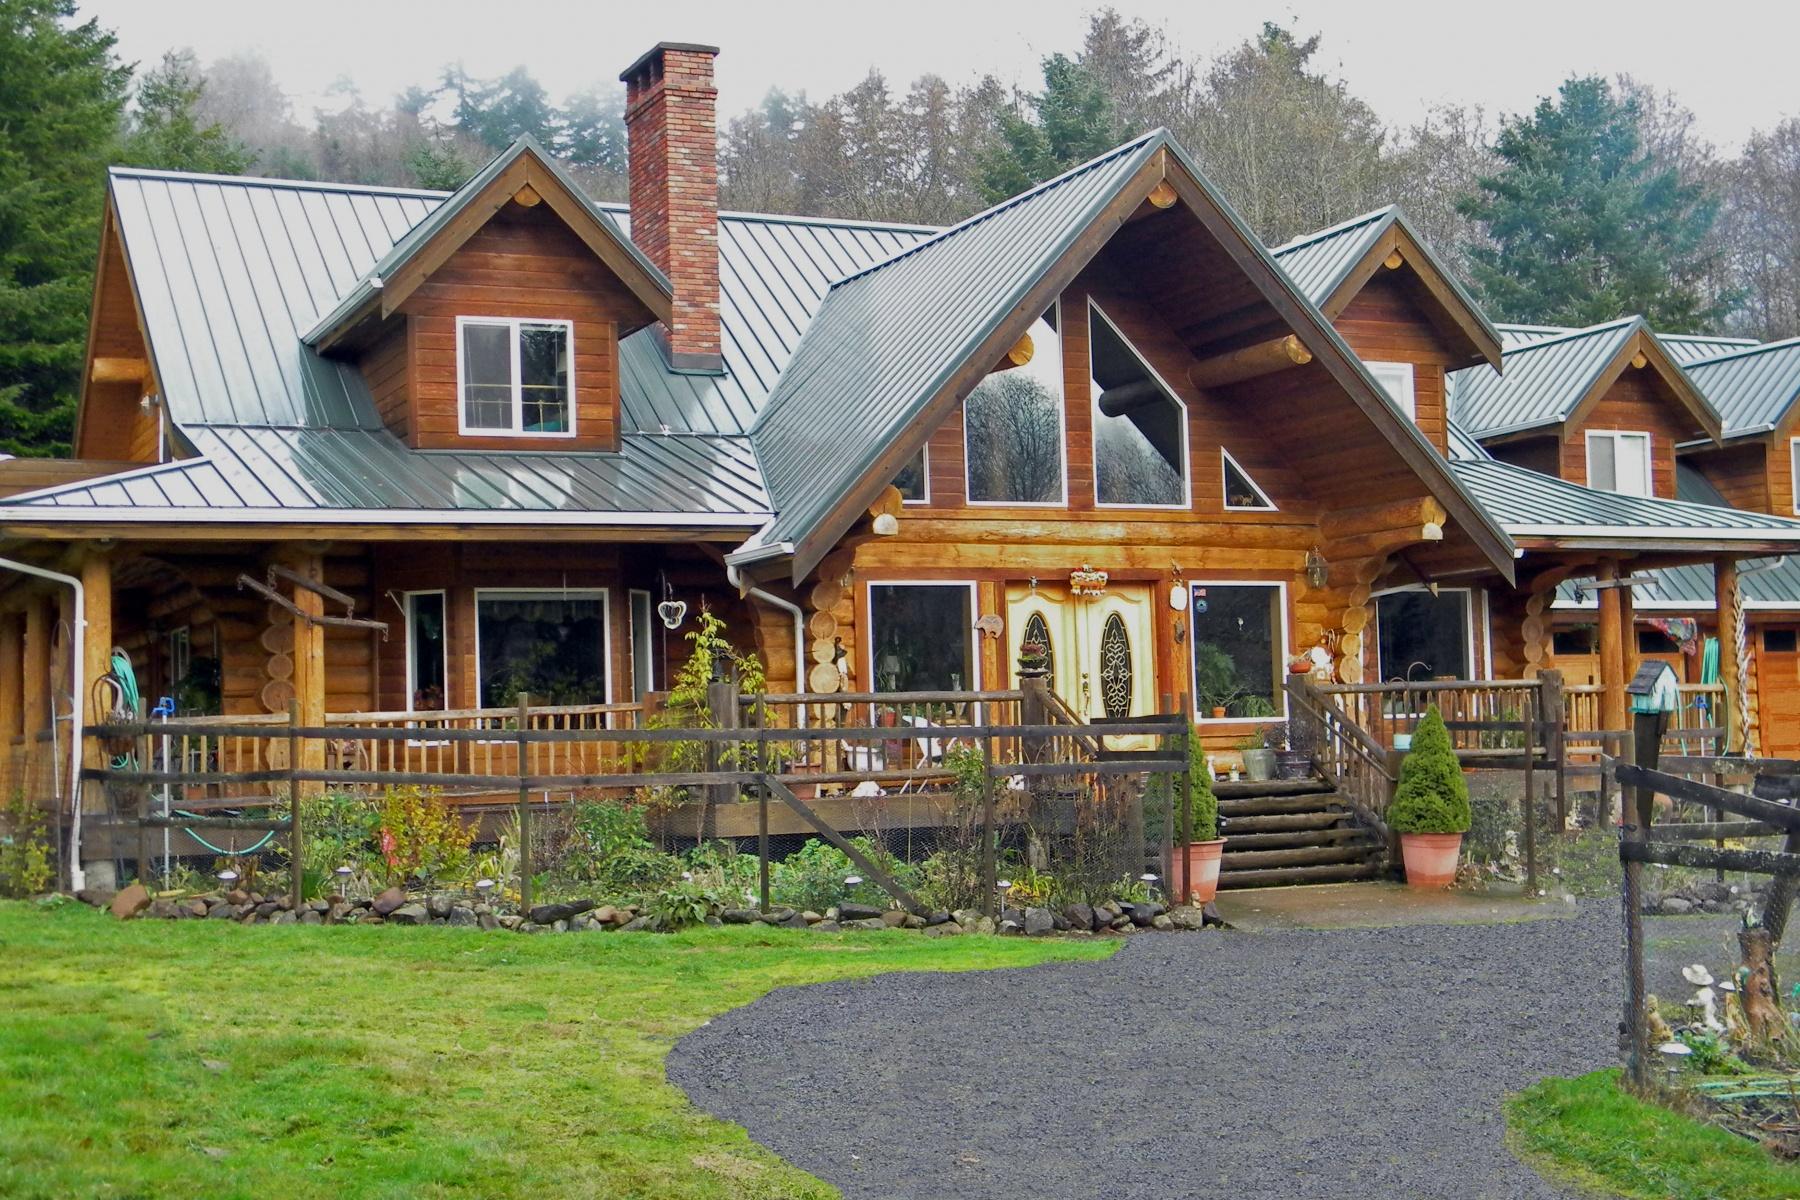 Single Family Home for Sale at 34595 Upper Nestucca River 34595 Upper Nestucca River Rd Tillamook, Oregon 97108 United States